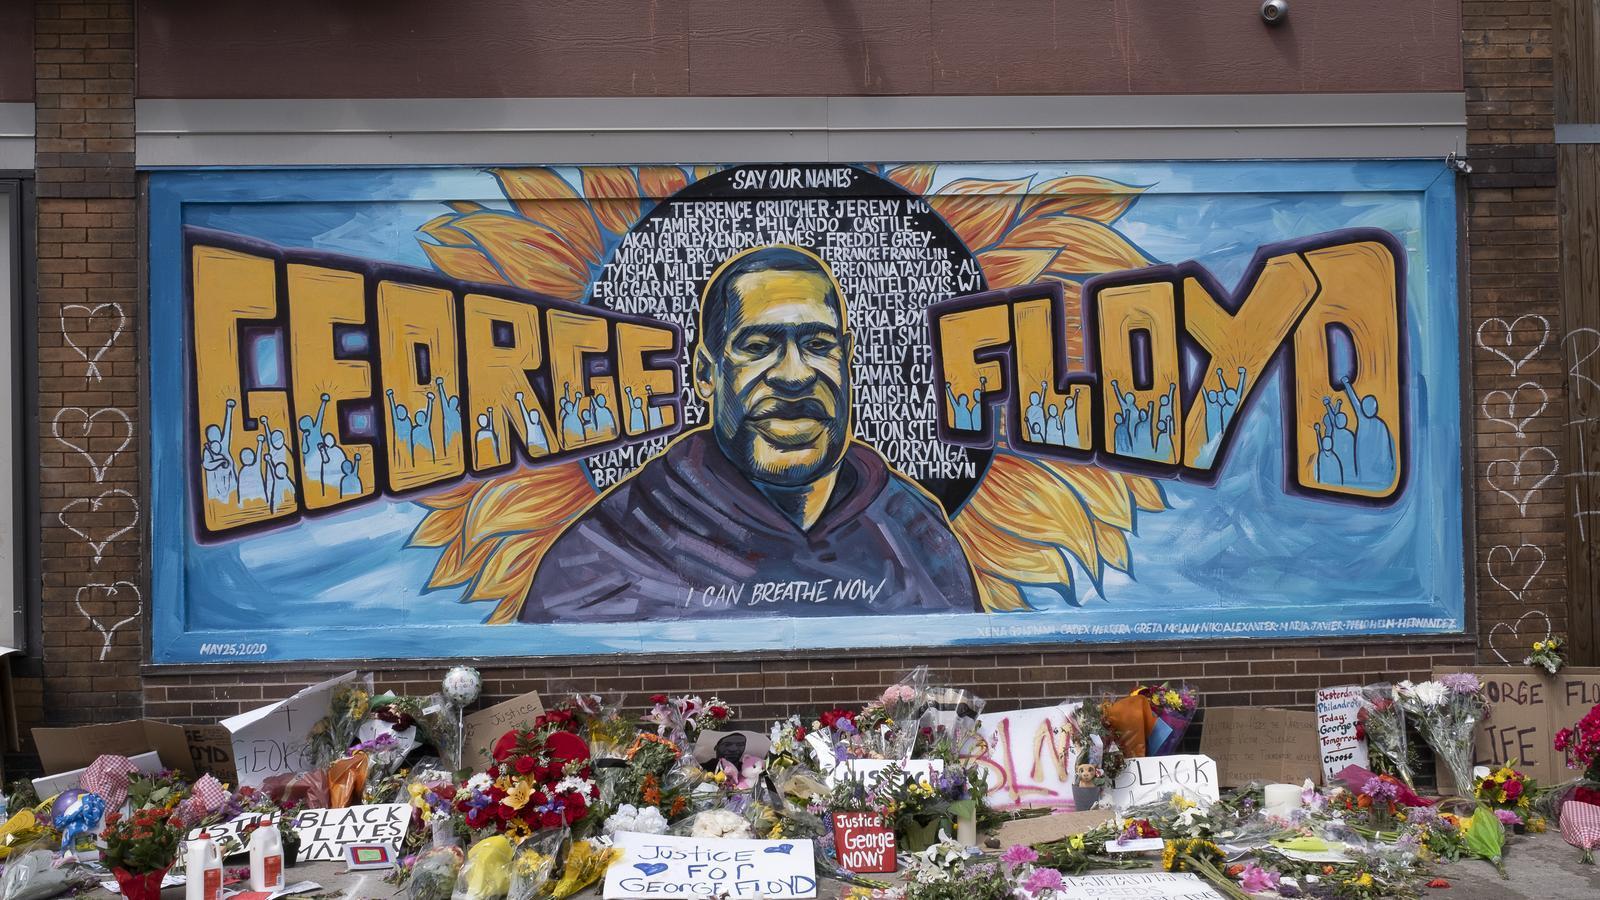 Un mural en memòria de George Floyds ple de flors i de missatges reclamant la pau, a Minneapolis